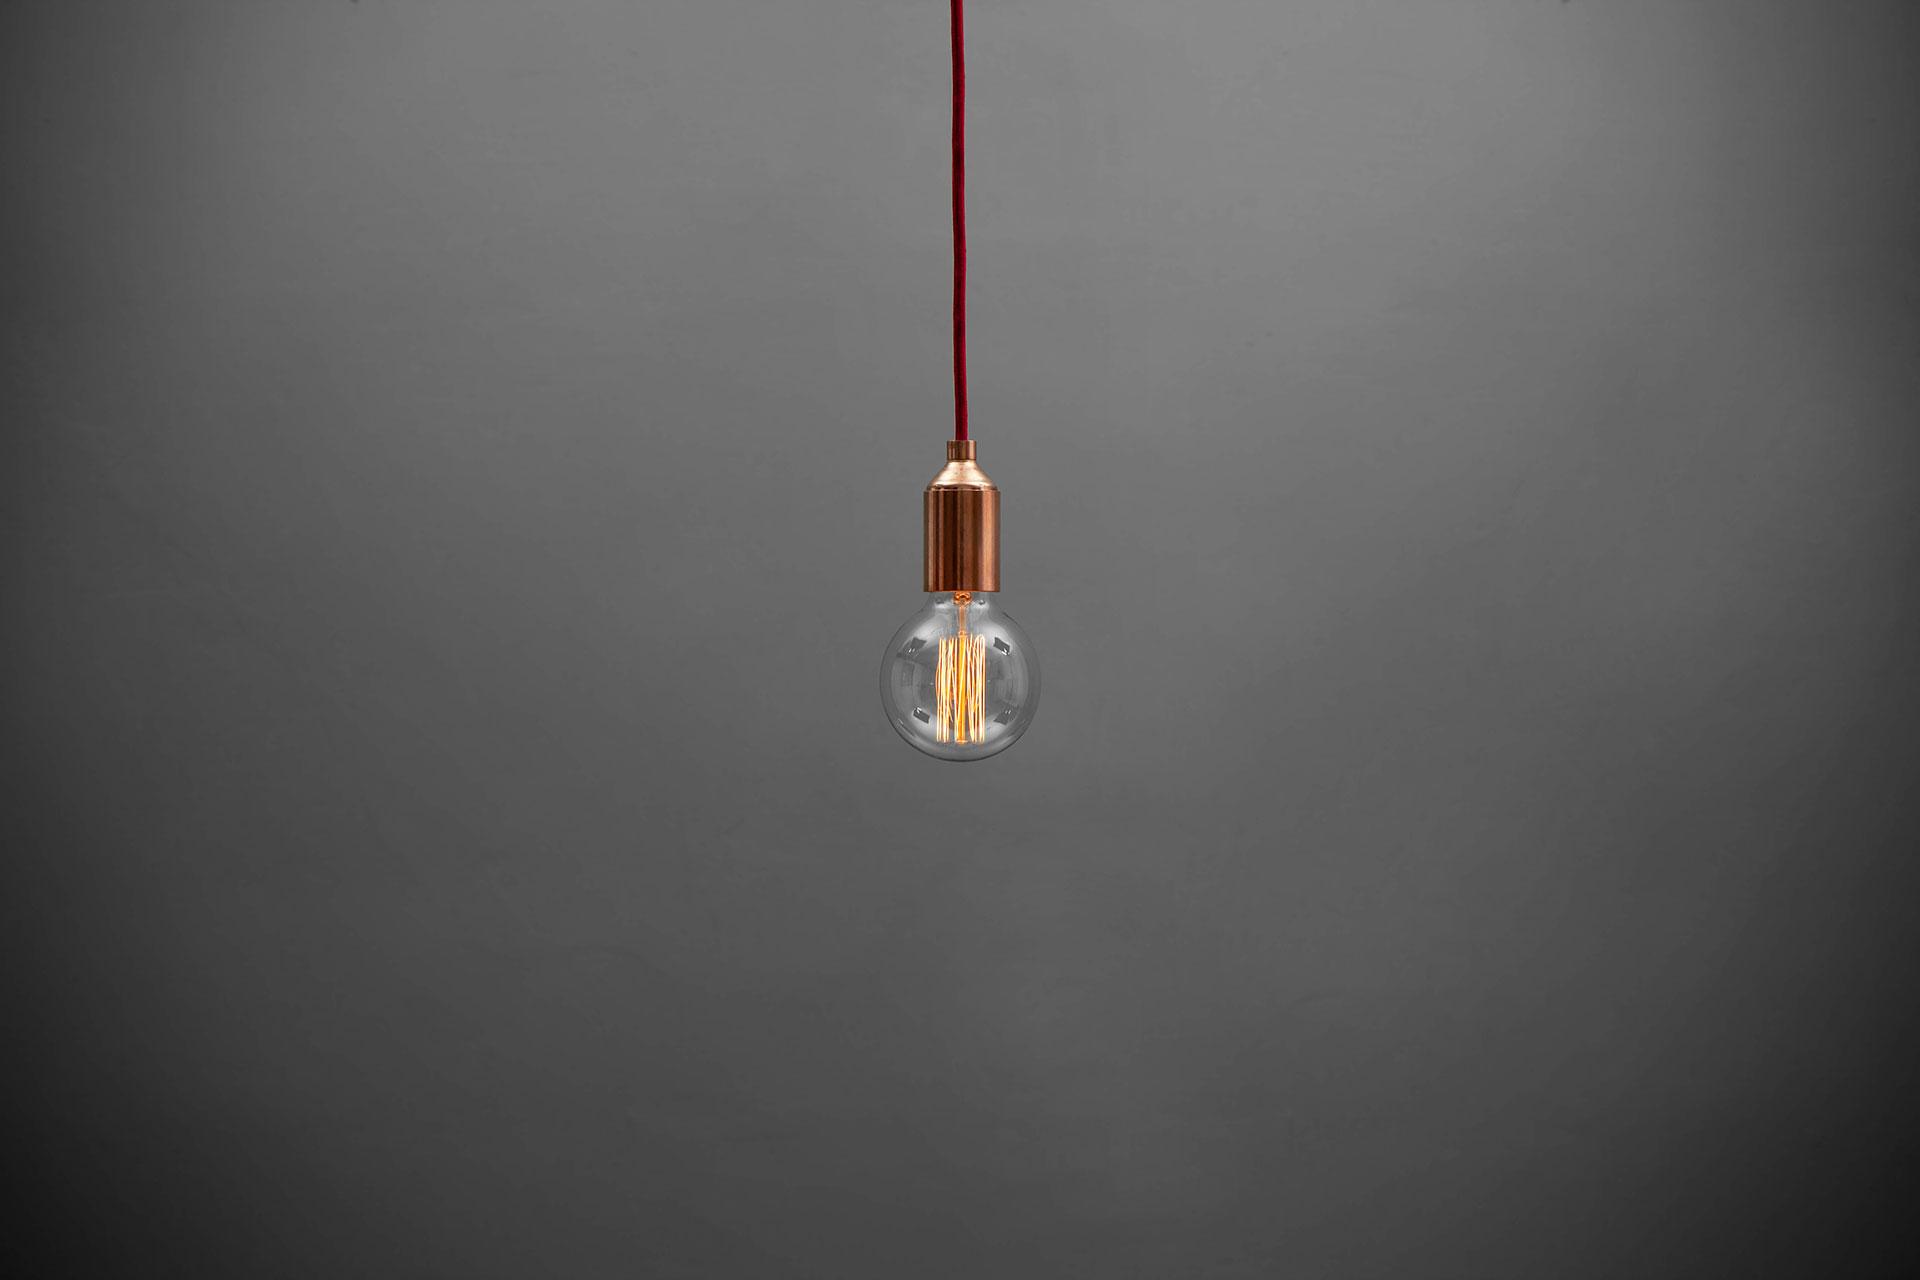 Industrial design copper pendant light with retro Edison bulb